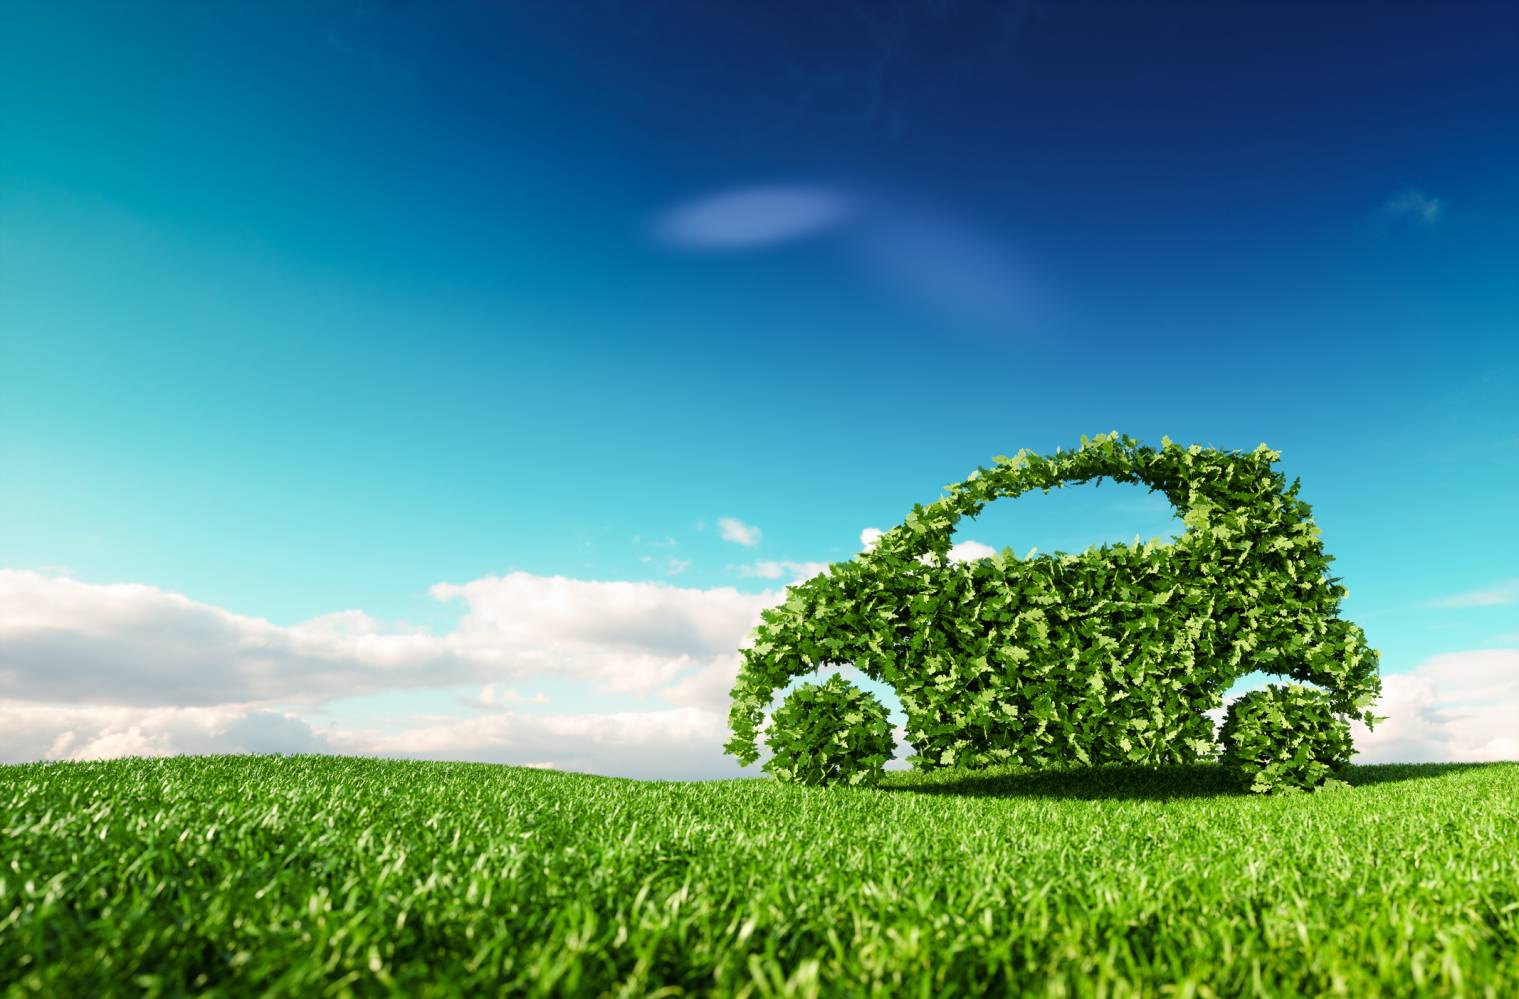 voiture vignette anti pollution